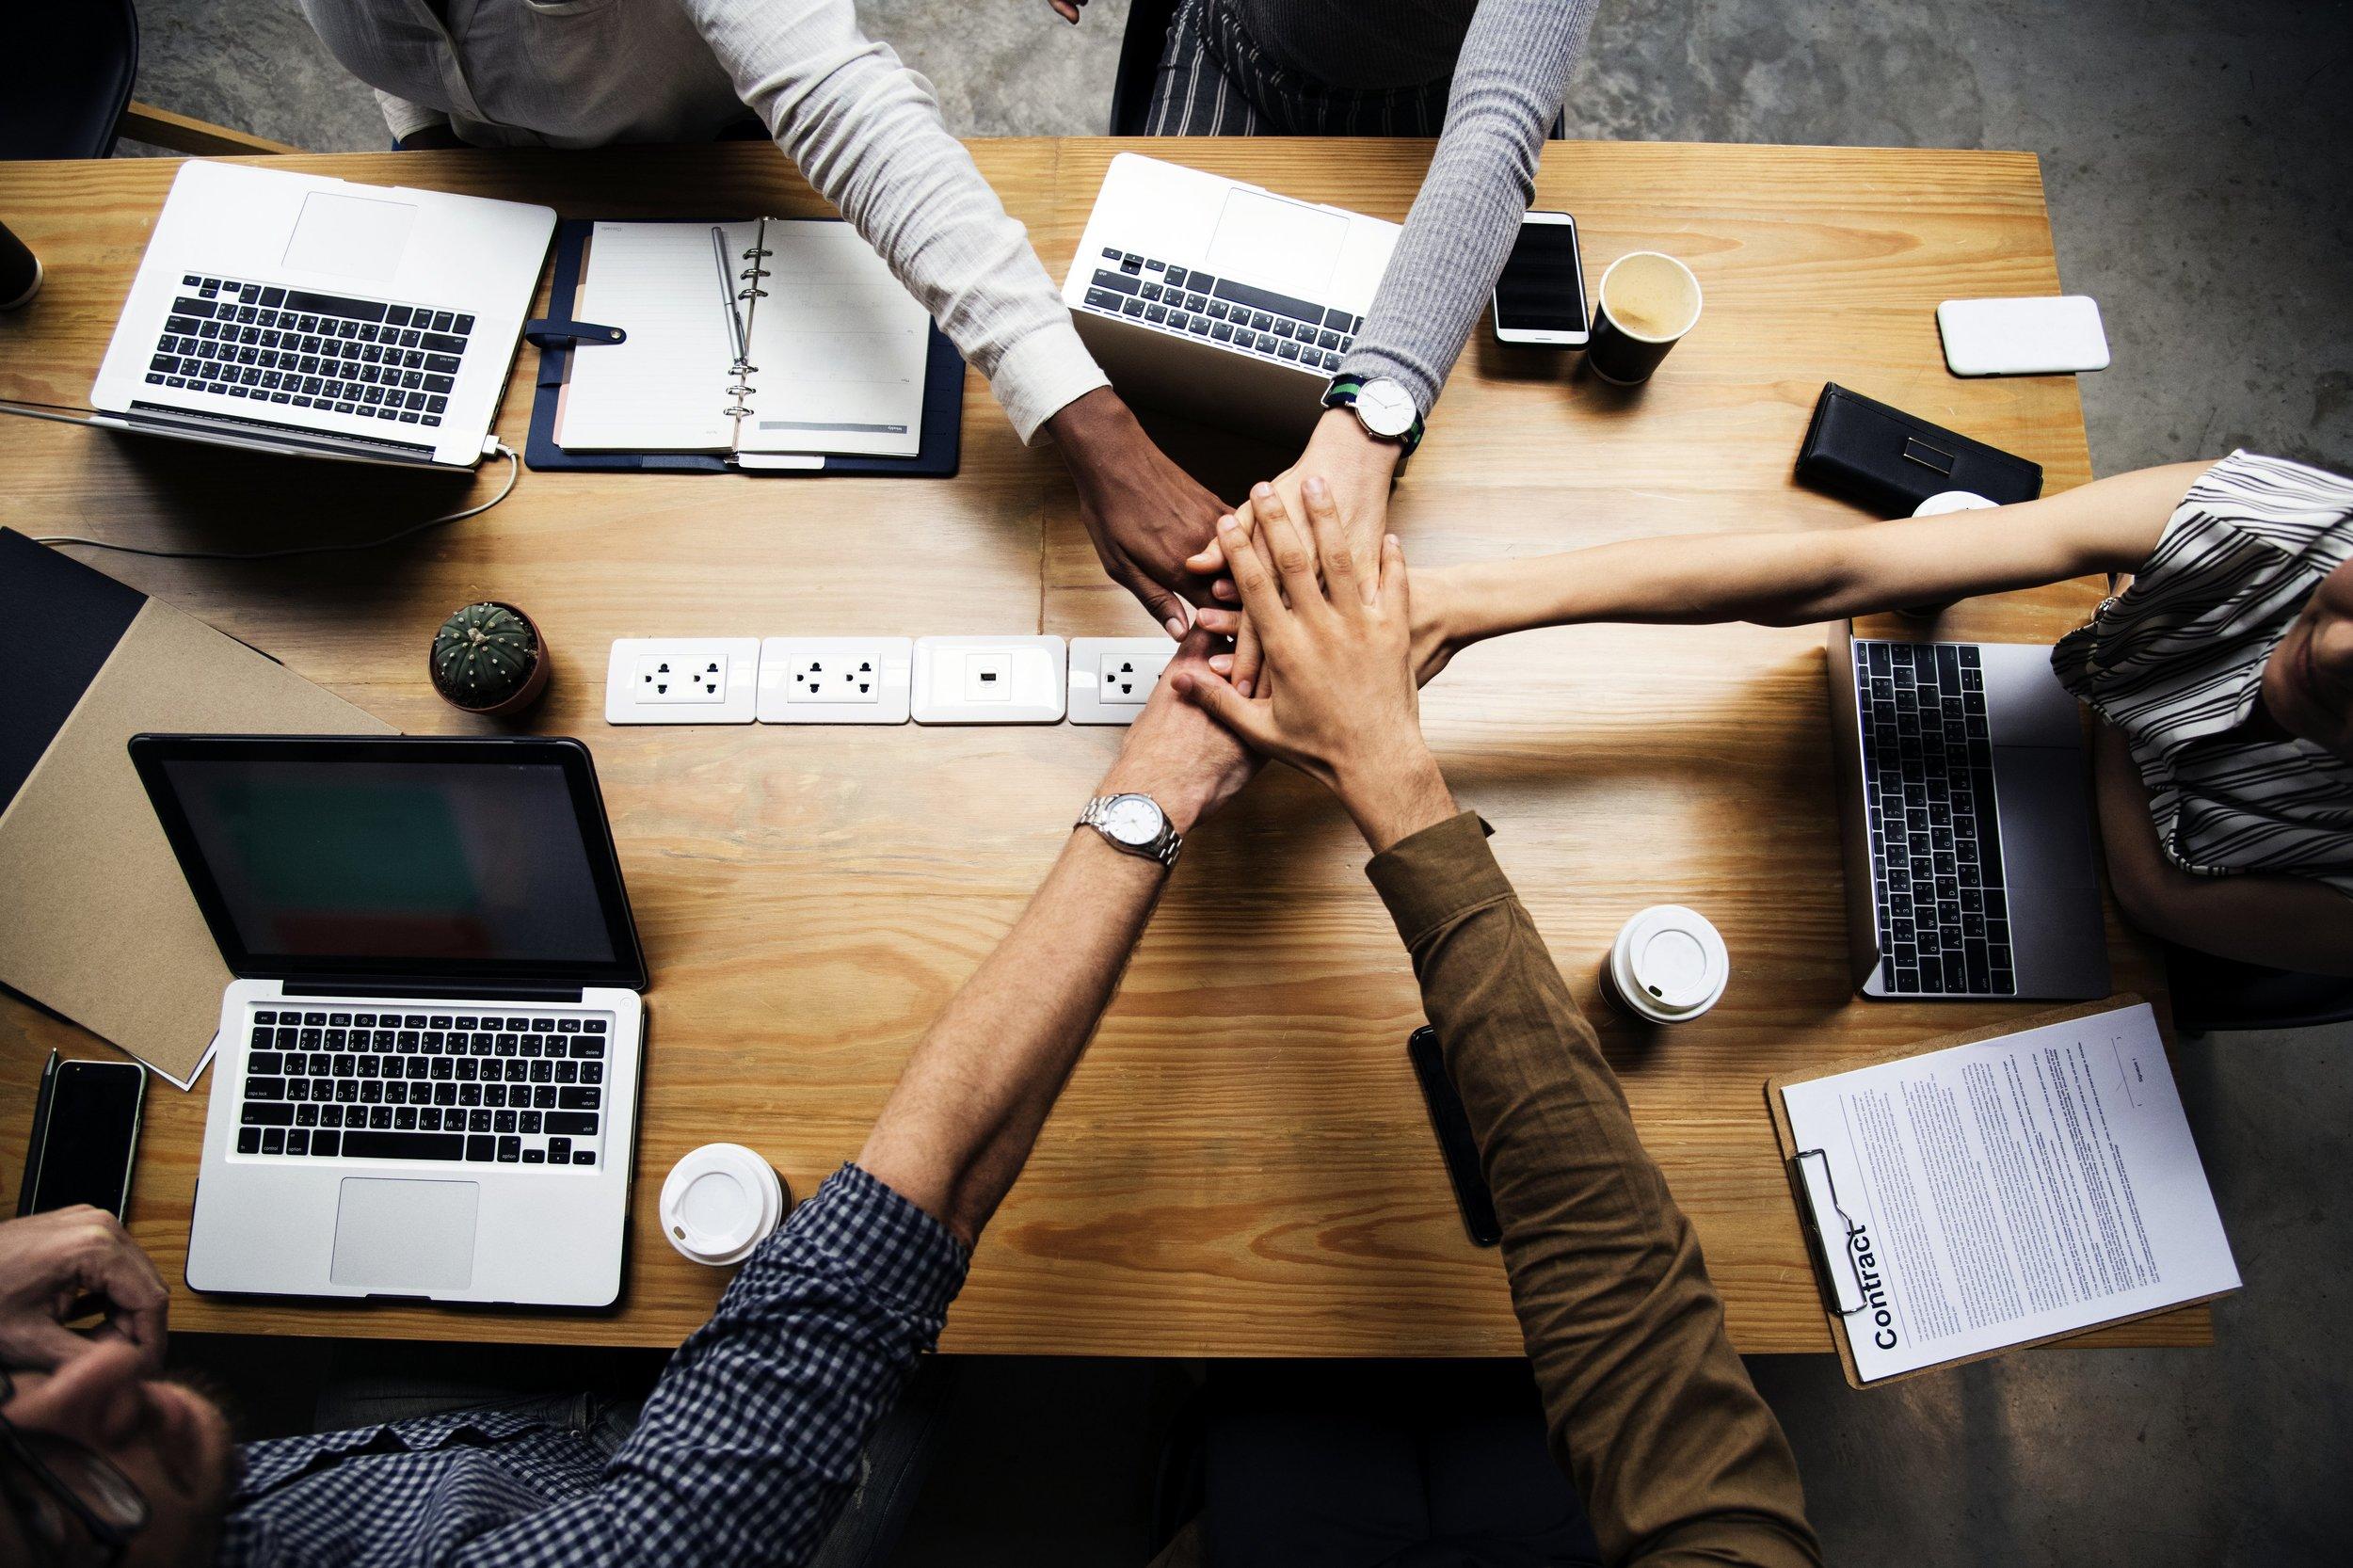 teamwork-makes-the-dream-work.png